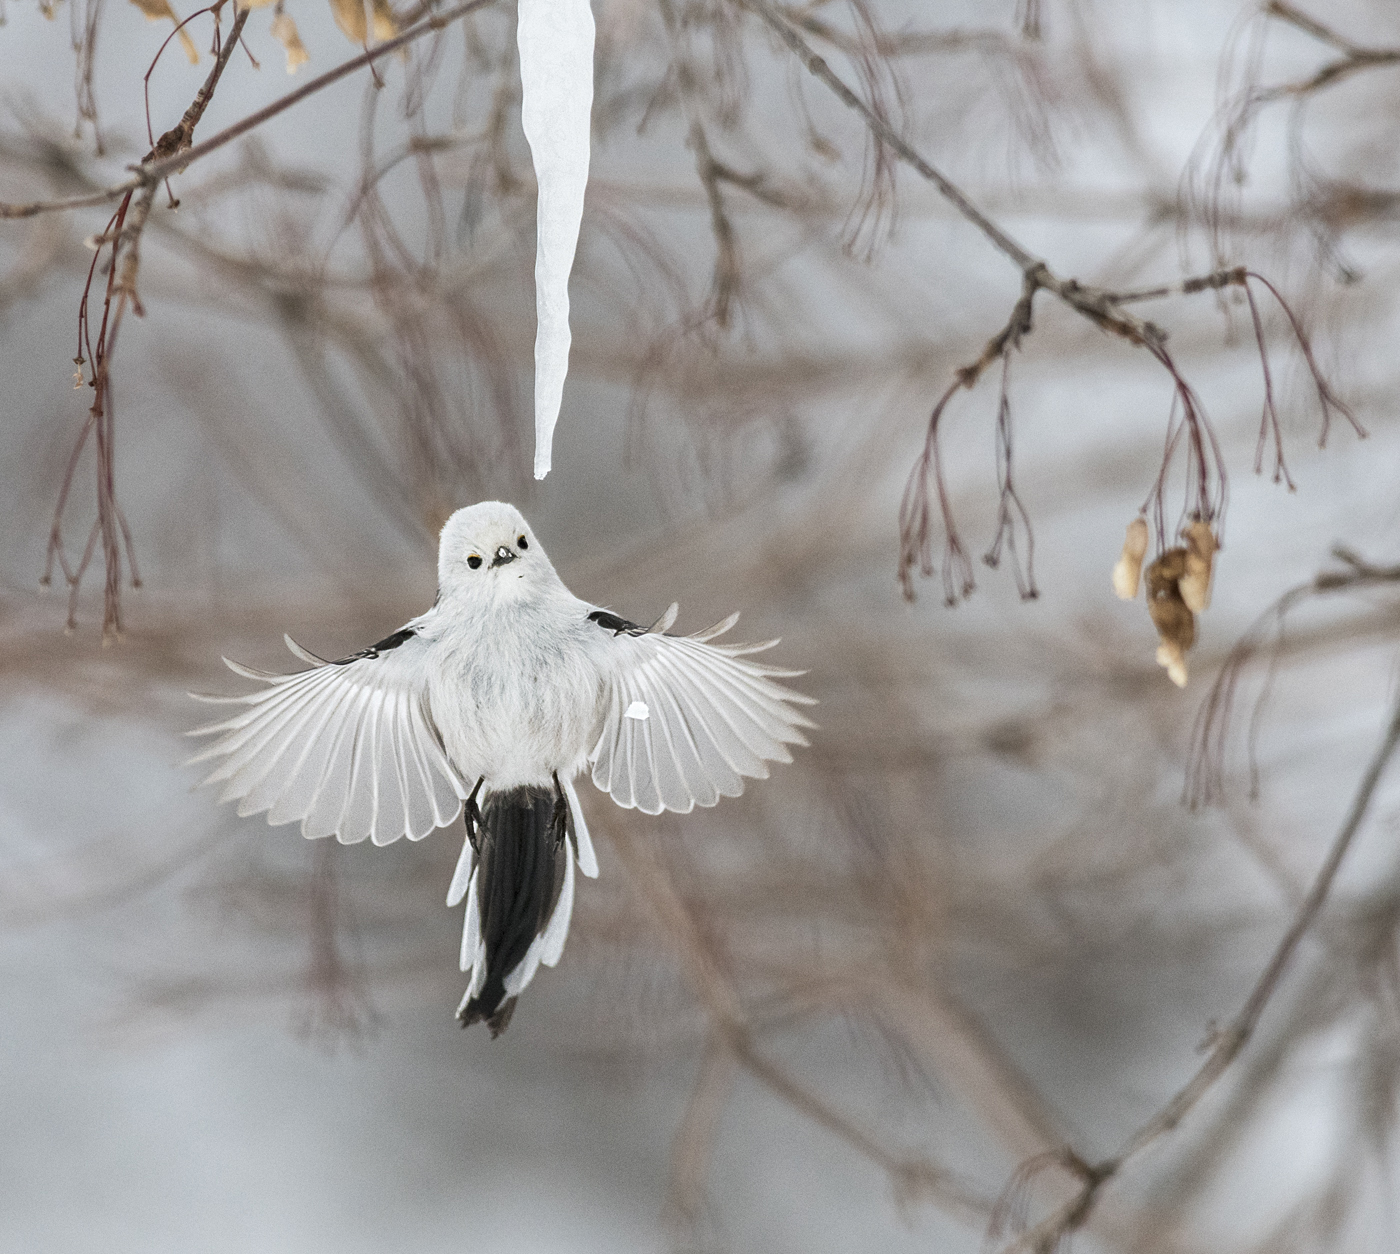 Diana_Rebman_BirdsHovering_1.jpg